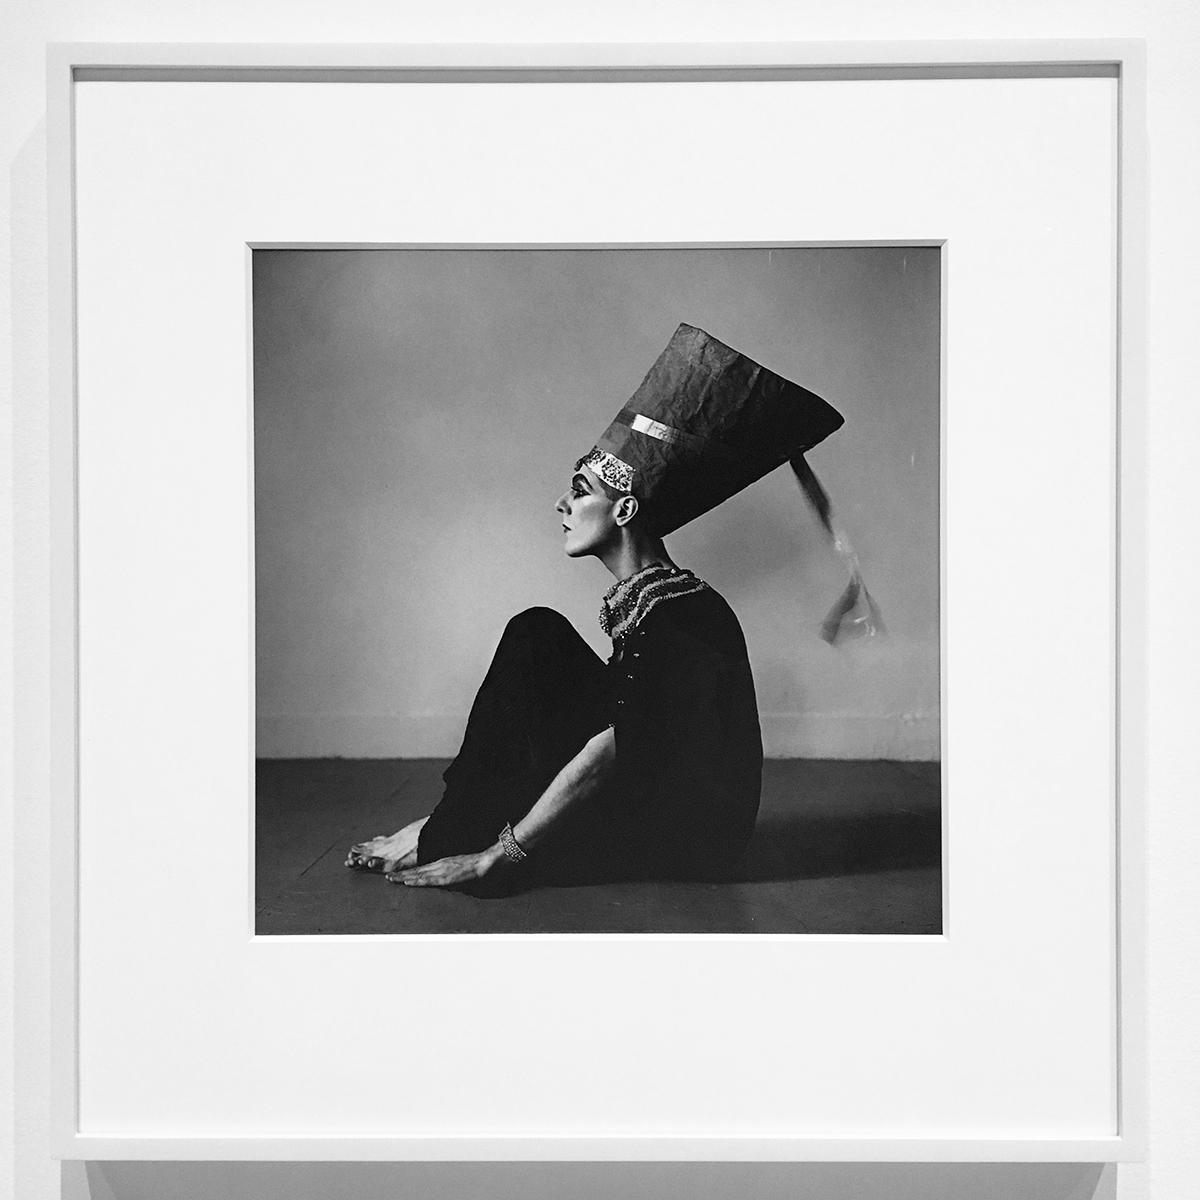 Peter Hujar, 1979, Ethyl Reichberger as Nefertiti (III)